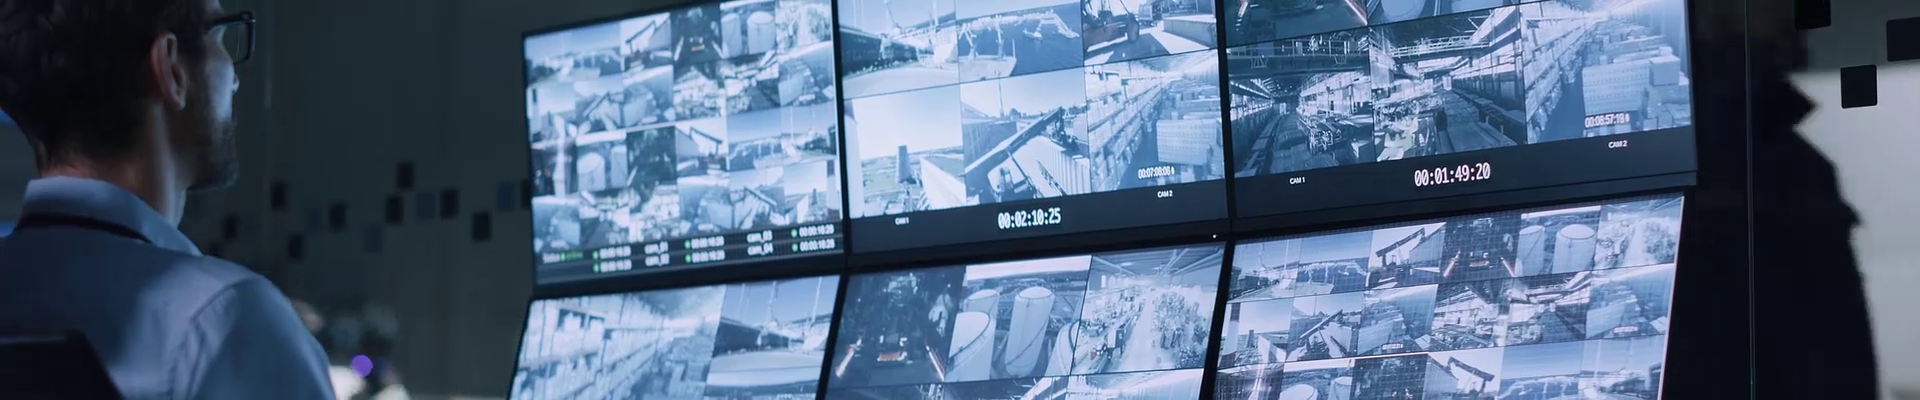 Monitoring and Intrusion Response